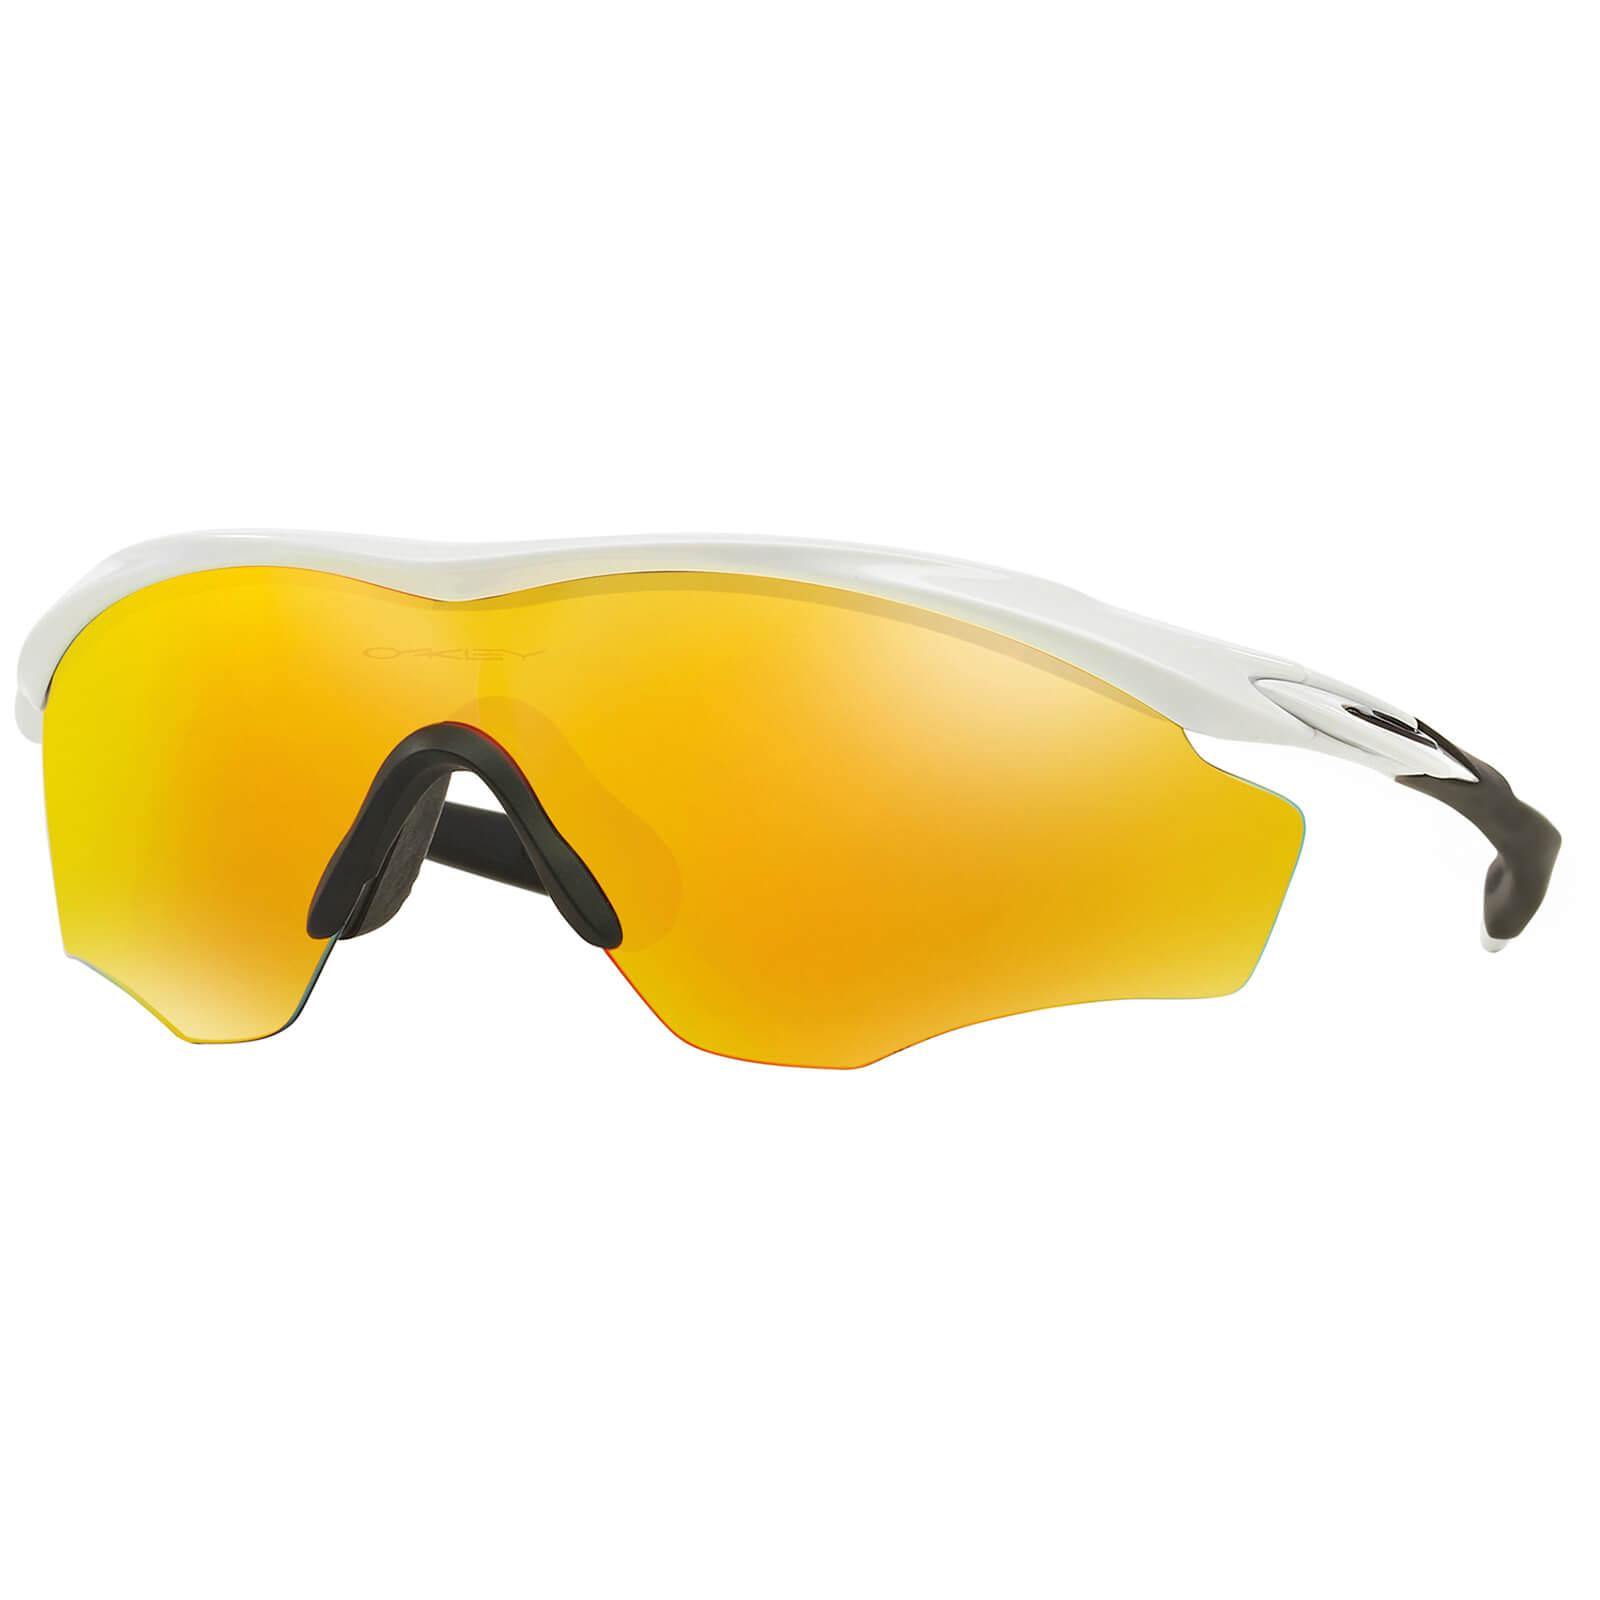 Oakley M2 XL Frame Road Sunglasses - Polished White/Fire Irdium